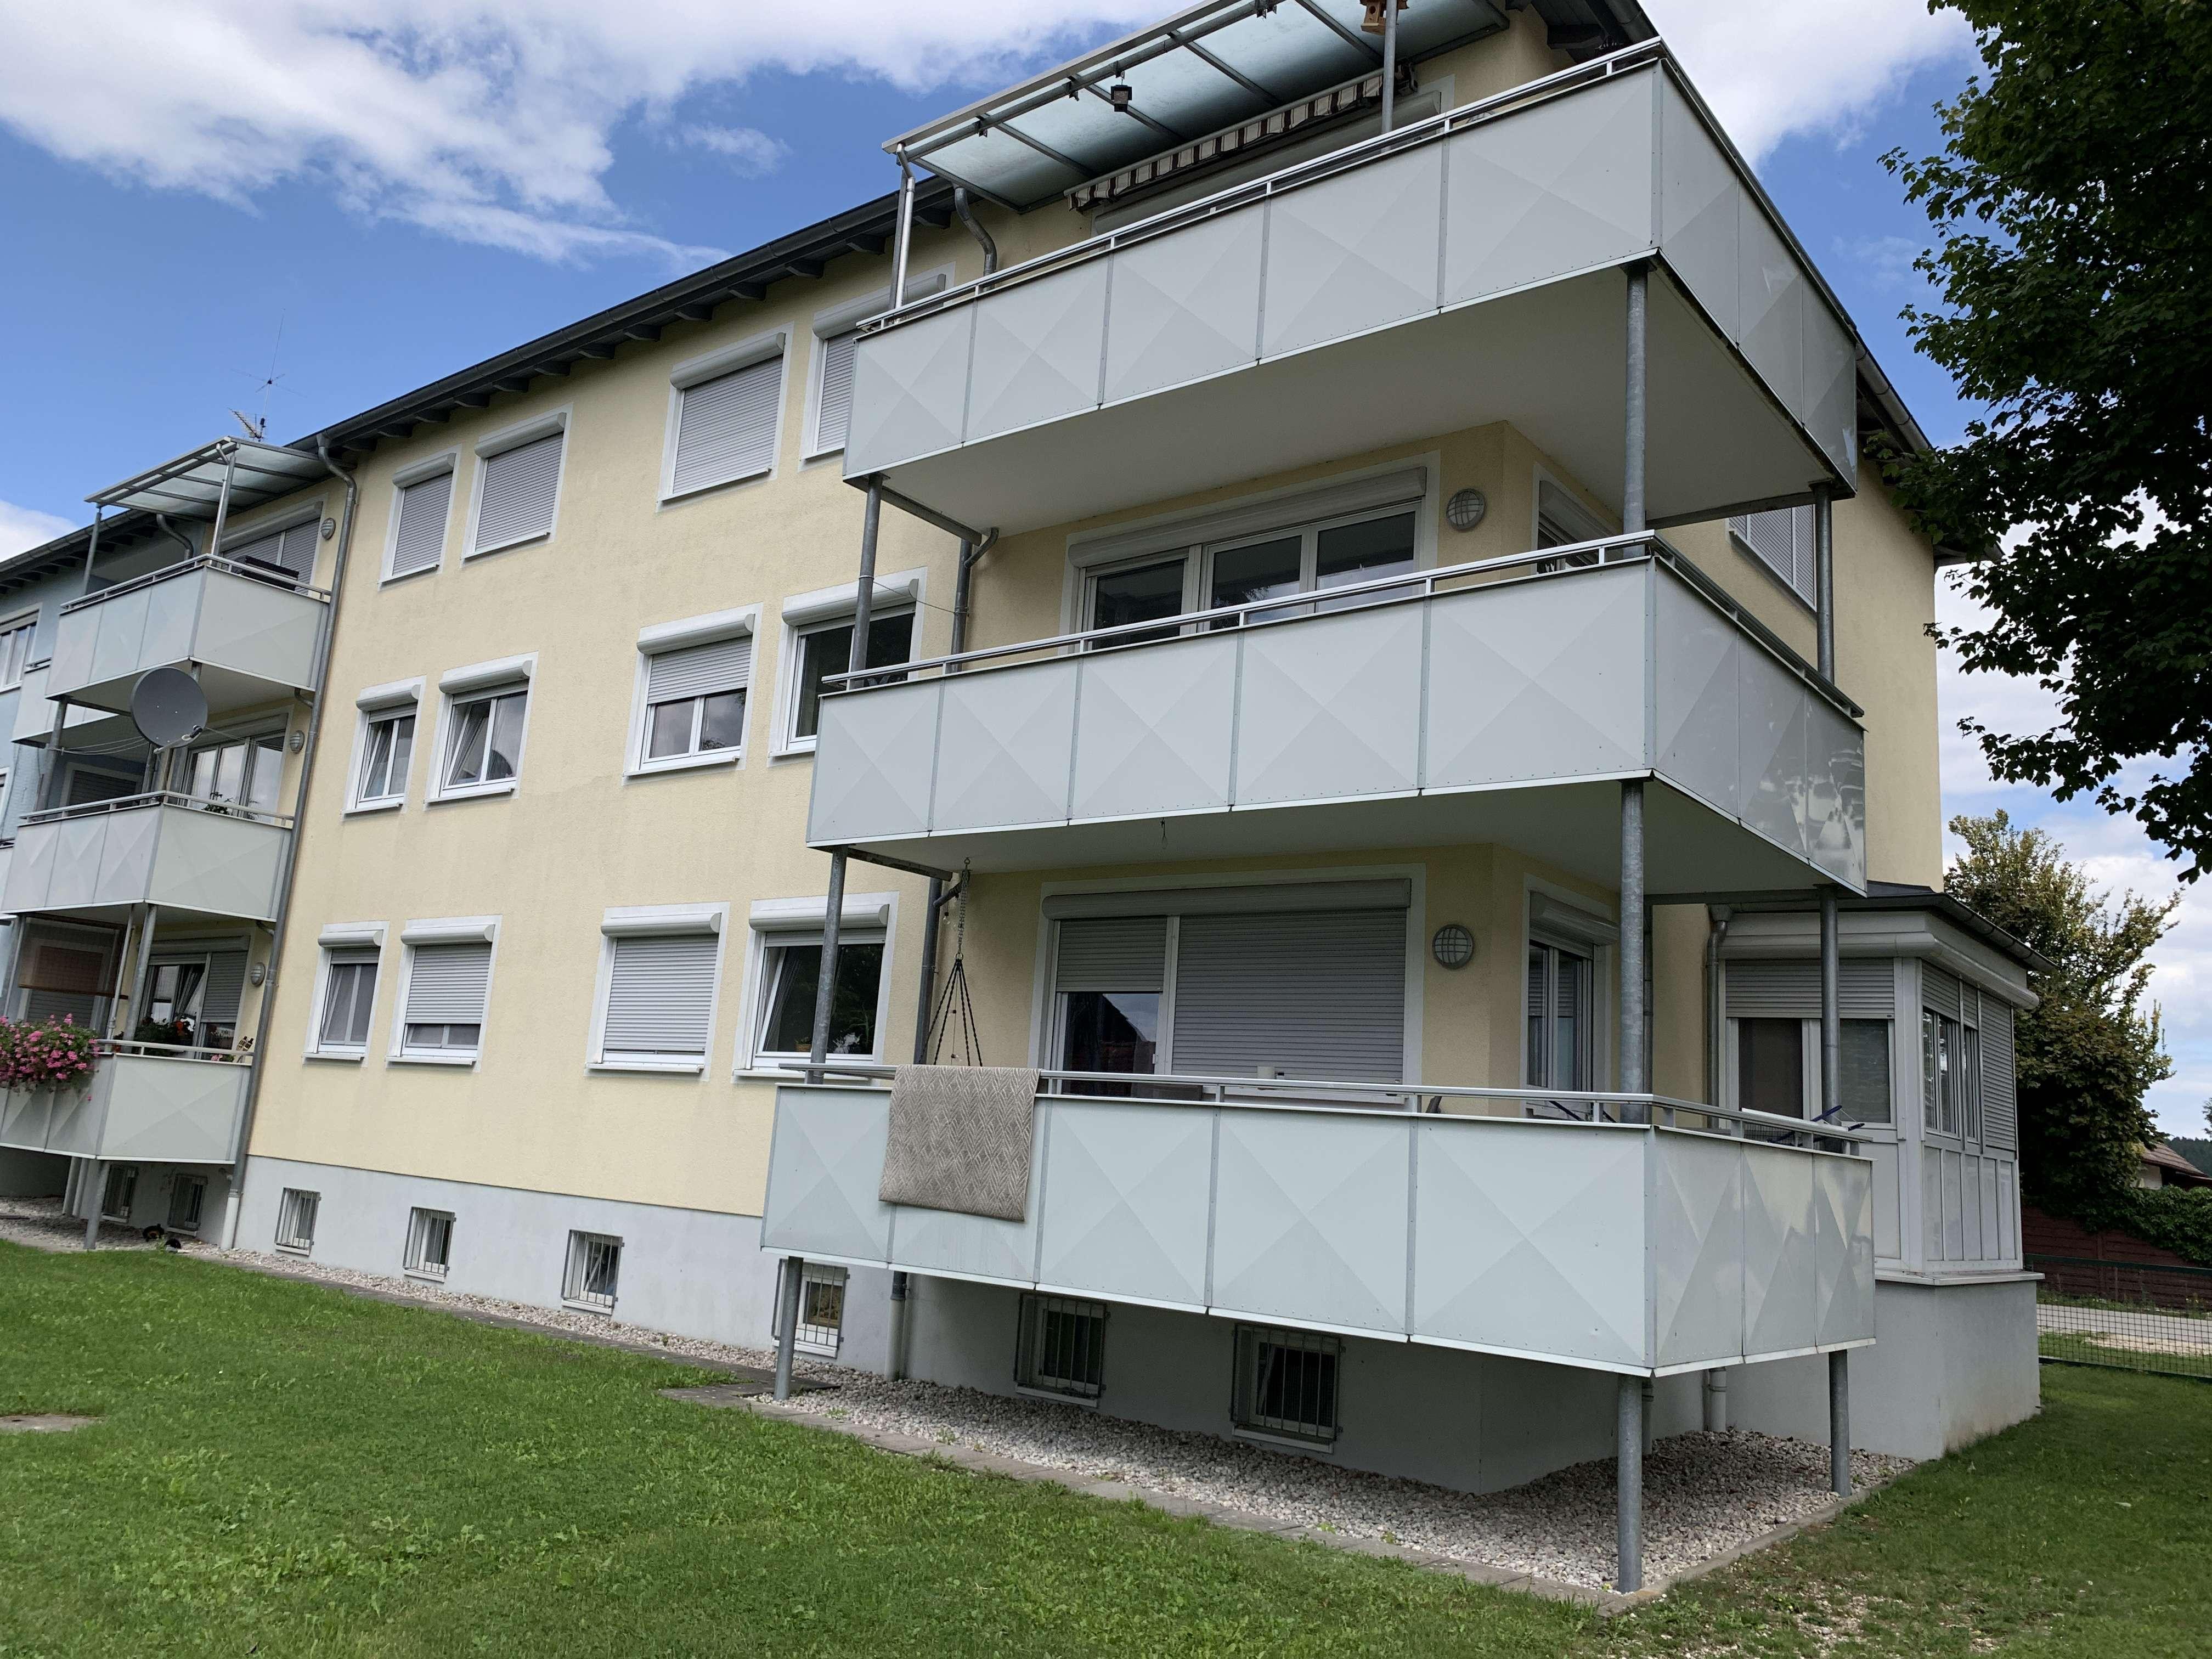 Großzügige 3 ZKB mit Balkon im 1. OG in